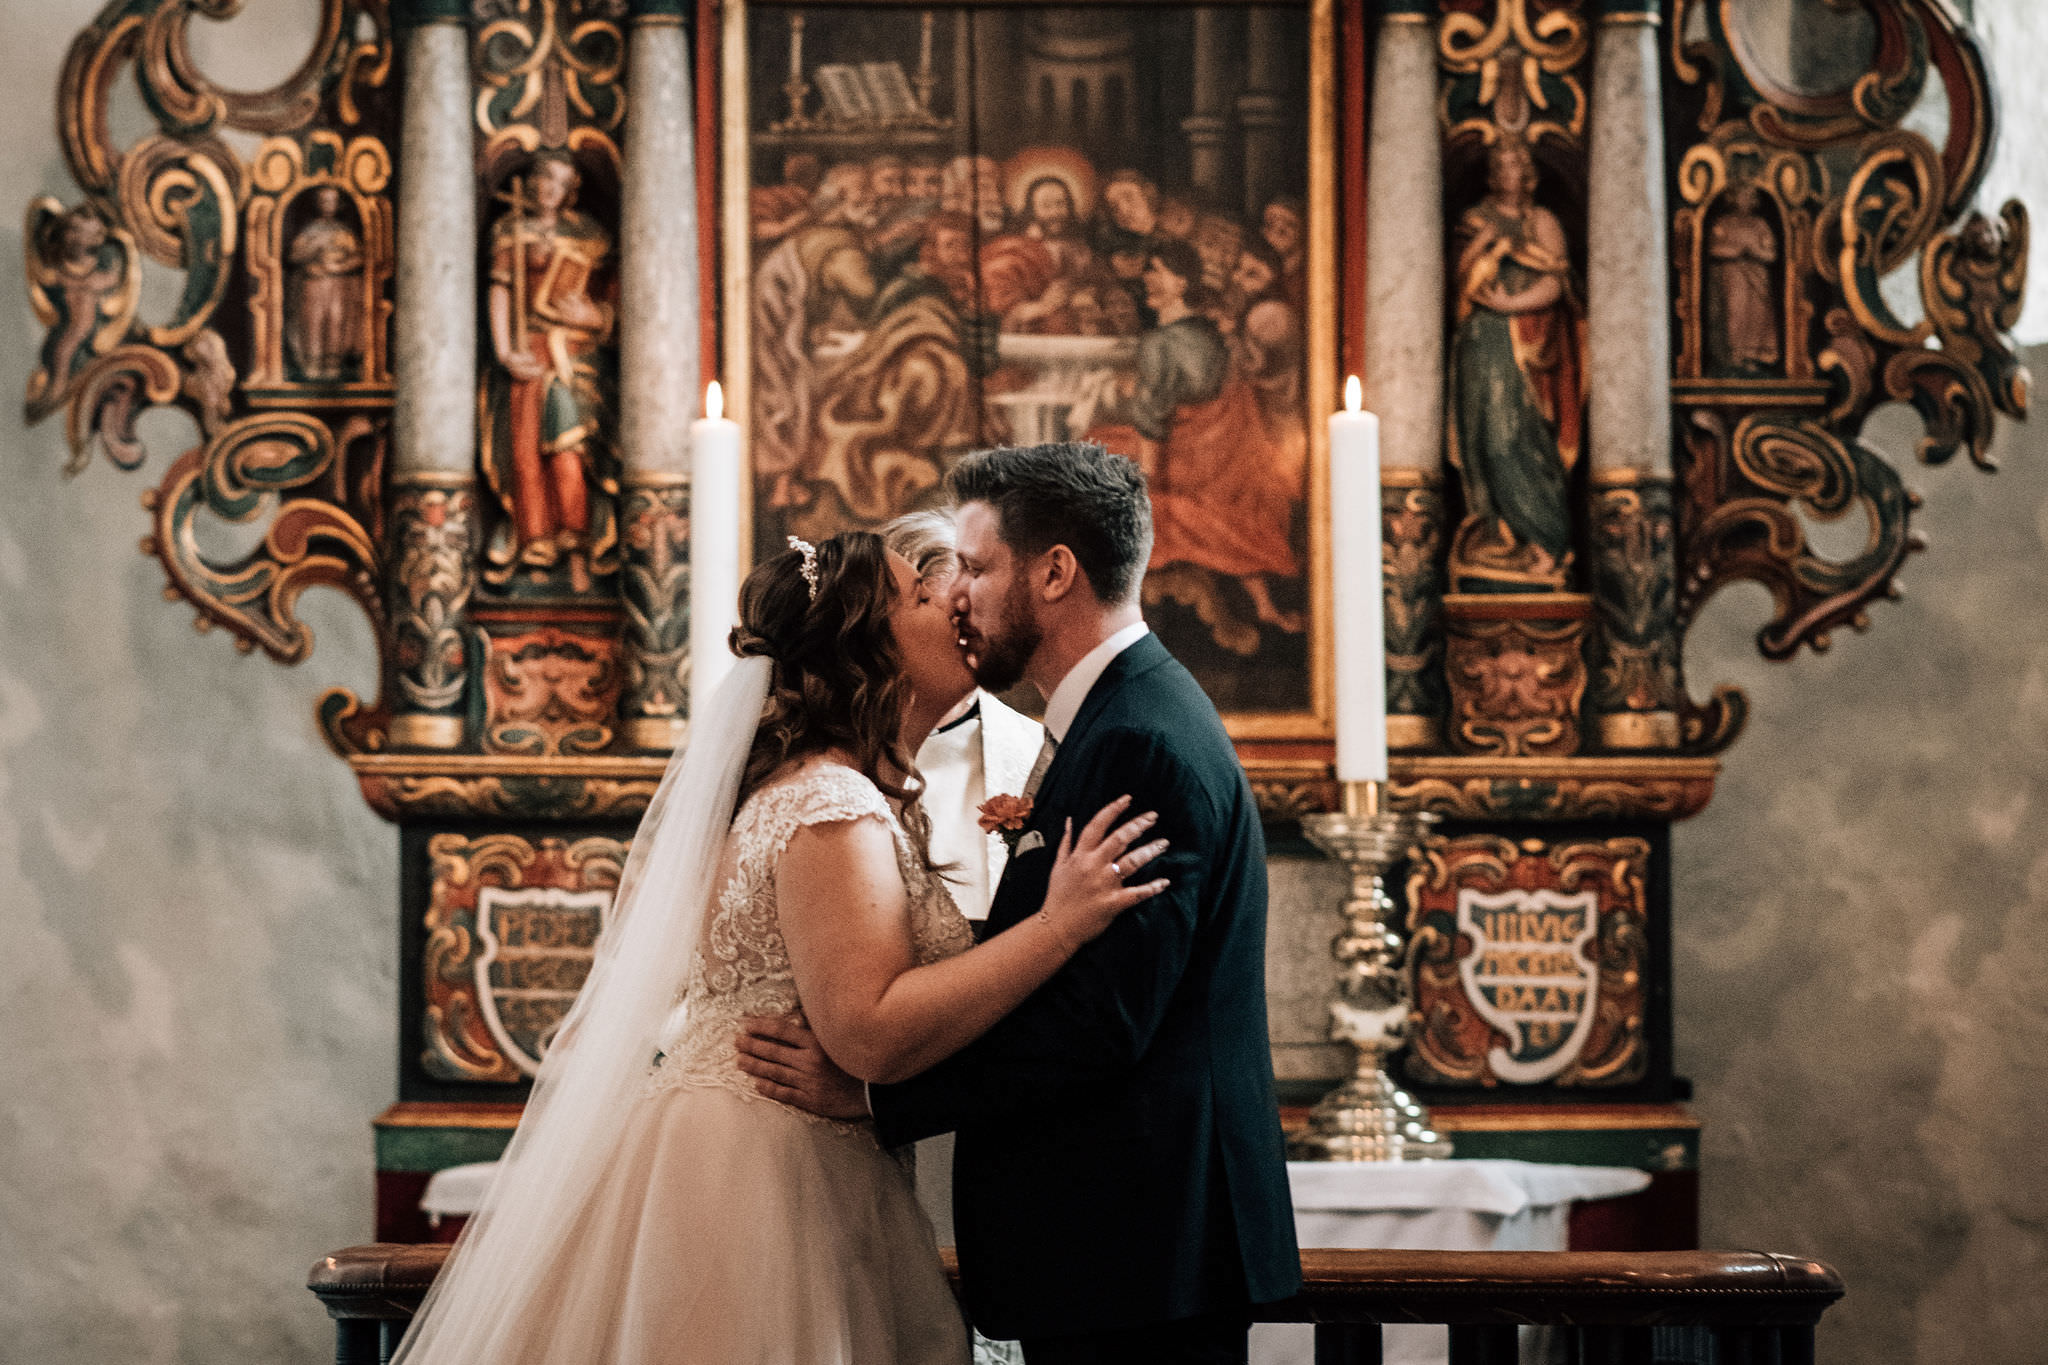 _N857706_fotografering_larvik_bryllup_aspargesgarden_.jpg